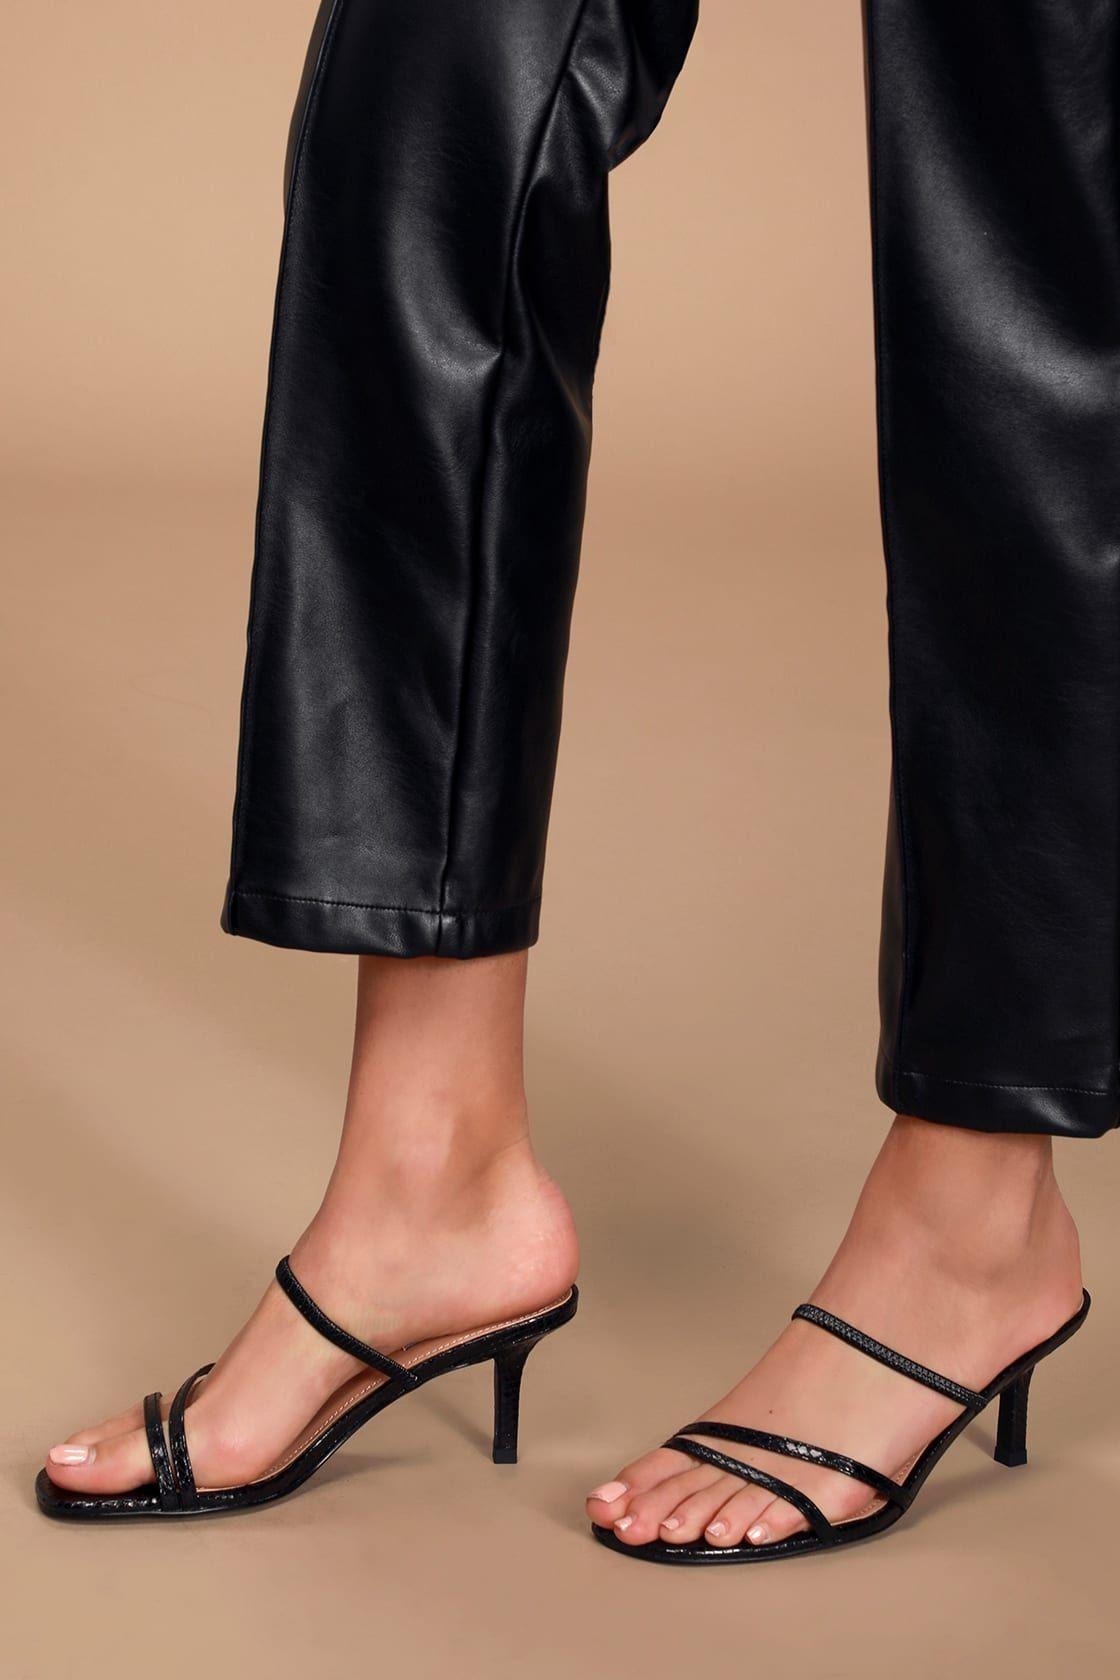 Loft Black Snake Strappy High Heel Sandals In 2020 Strappy High Heels Sandals Sandals Heels Strappy High Heels